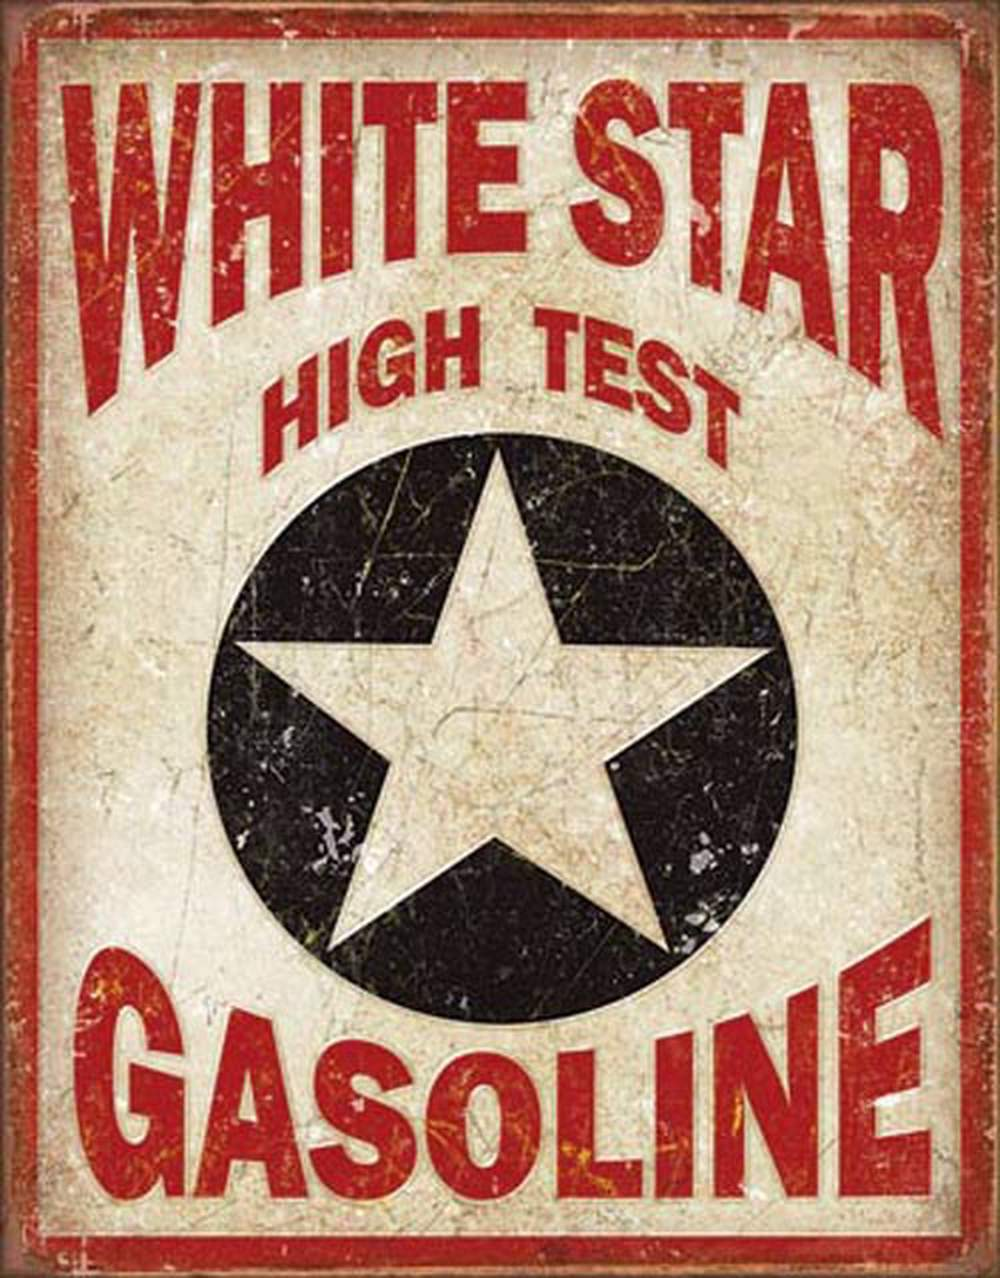 Tin Sign - White Star High Test Gasoline